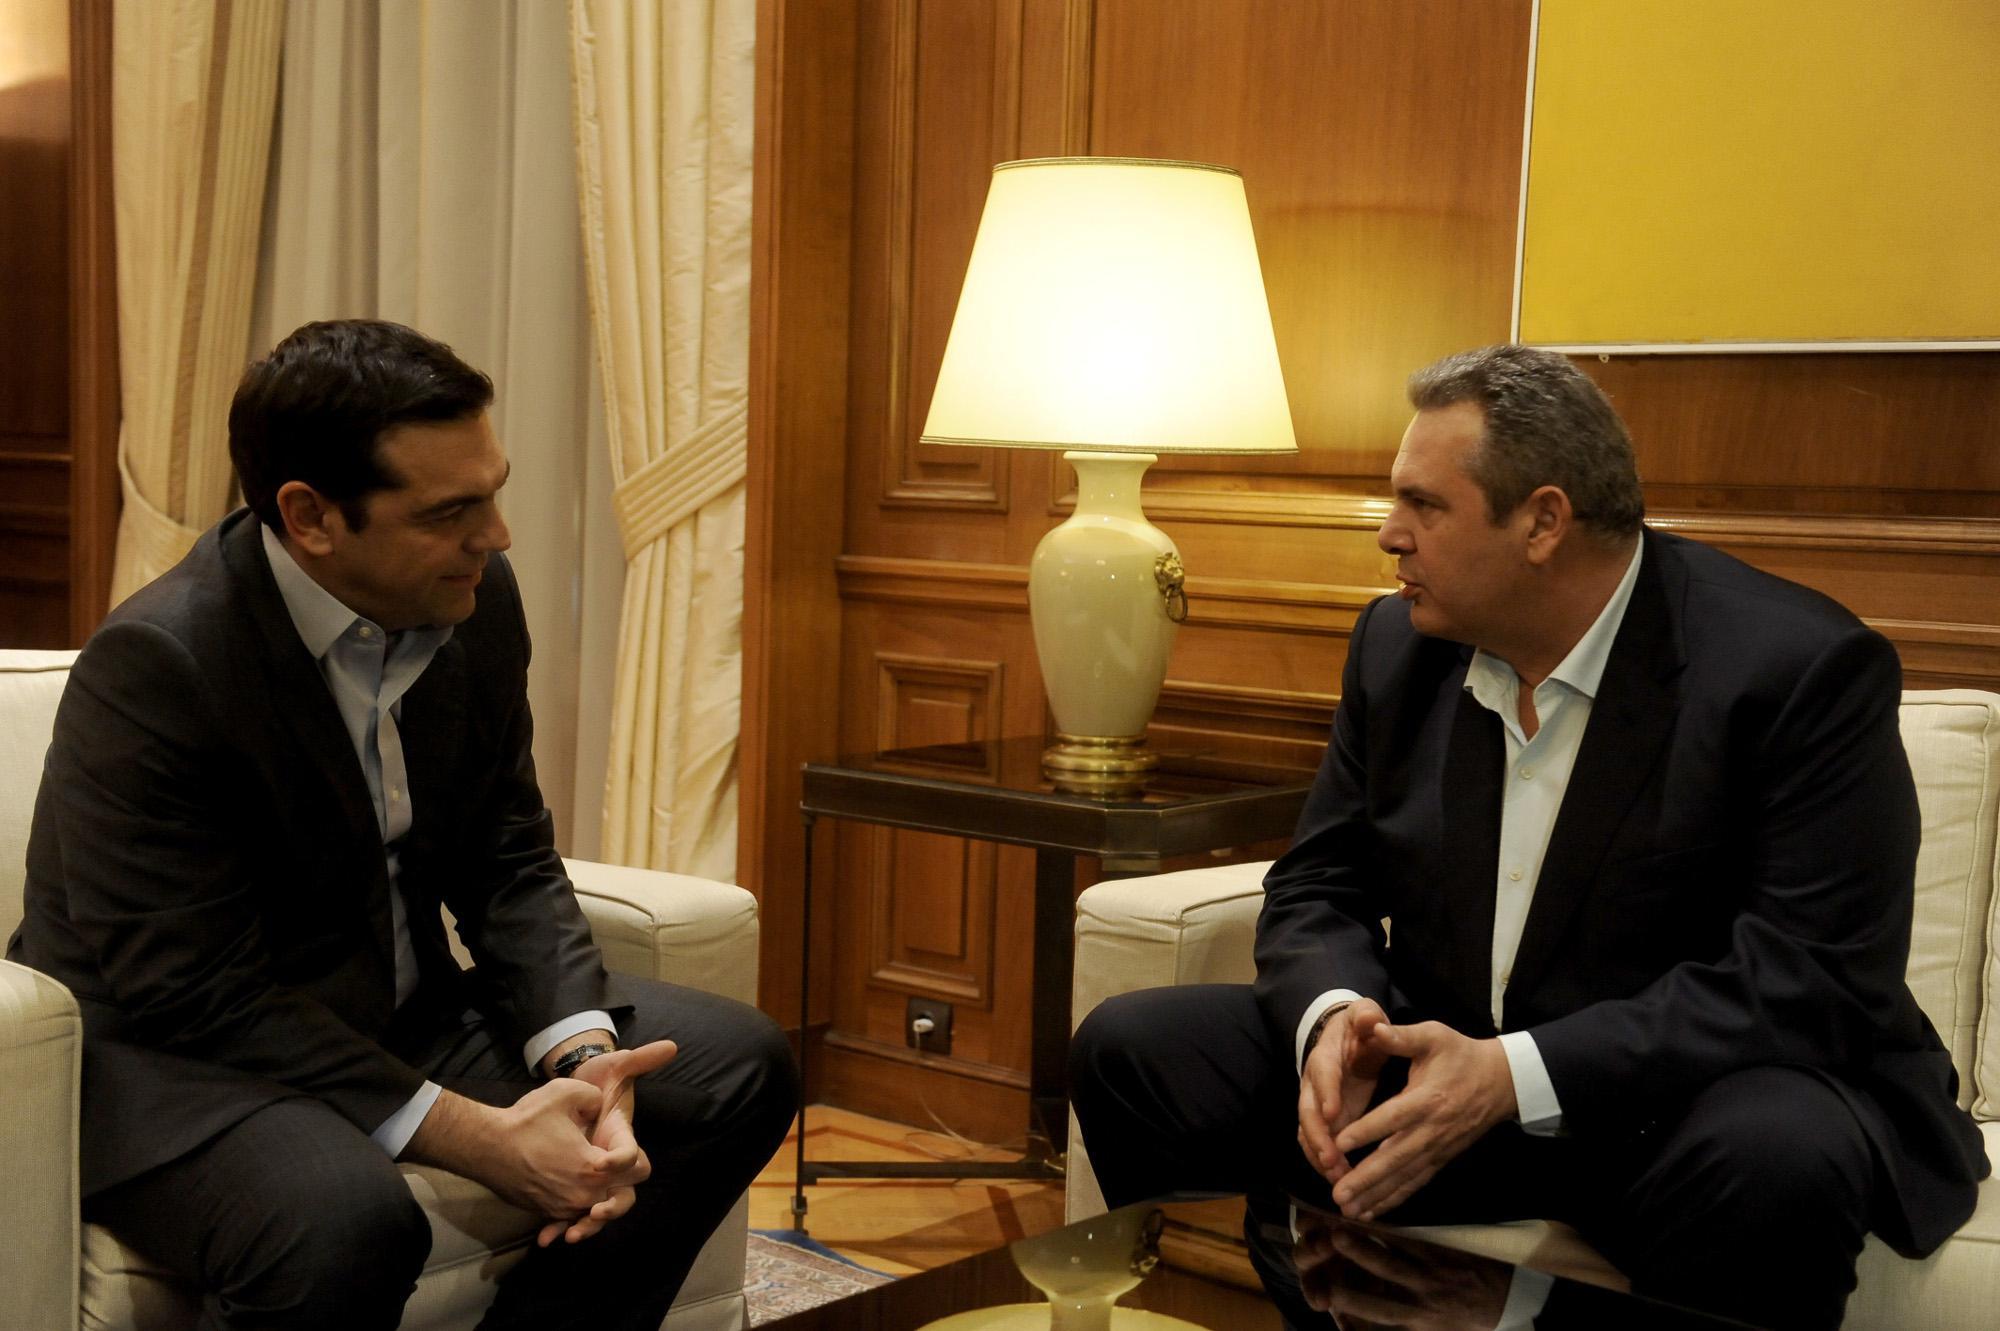 kammenos-tsipras-1300 Η «επόμενη μέρα» για το Κυπριακό μετά τη συνάντηση Τσίπρα με τους πολιτικούς αρχηγούς